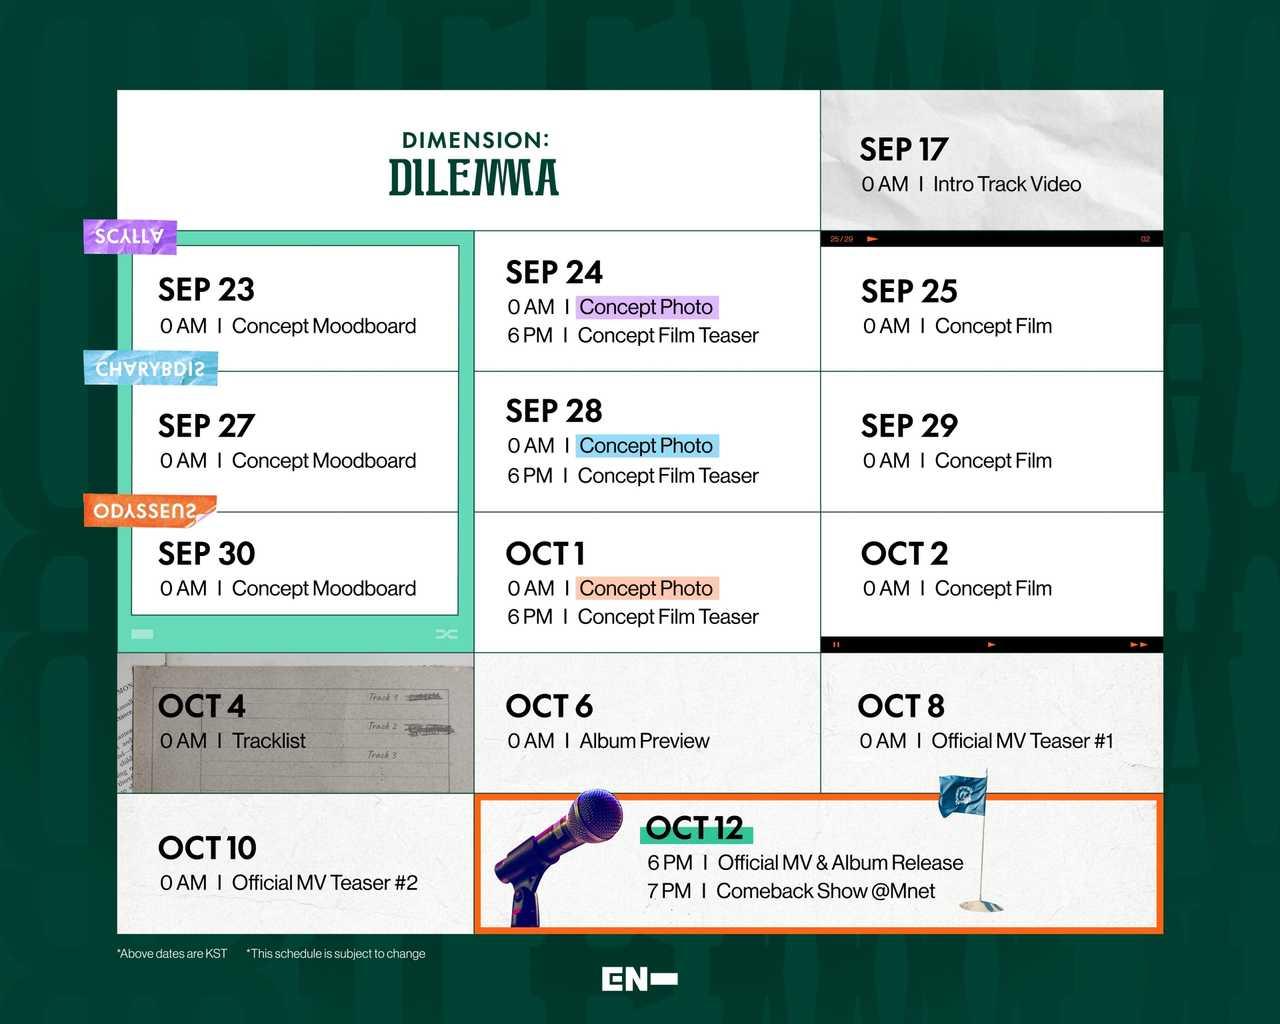 ENHYPEN  新アルバム『DIMENSION:DILEMMA』  プロモーションカレンダーで多彩なコンテンツを予告!